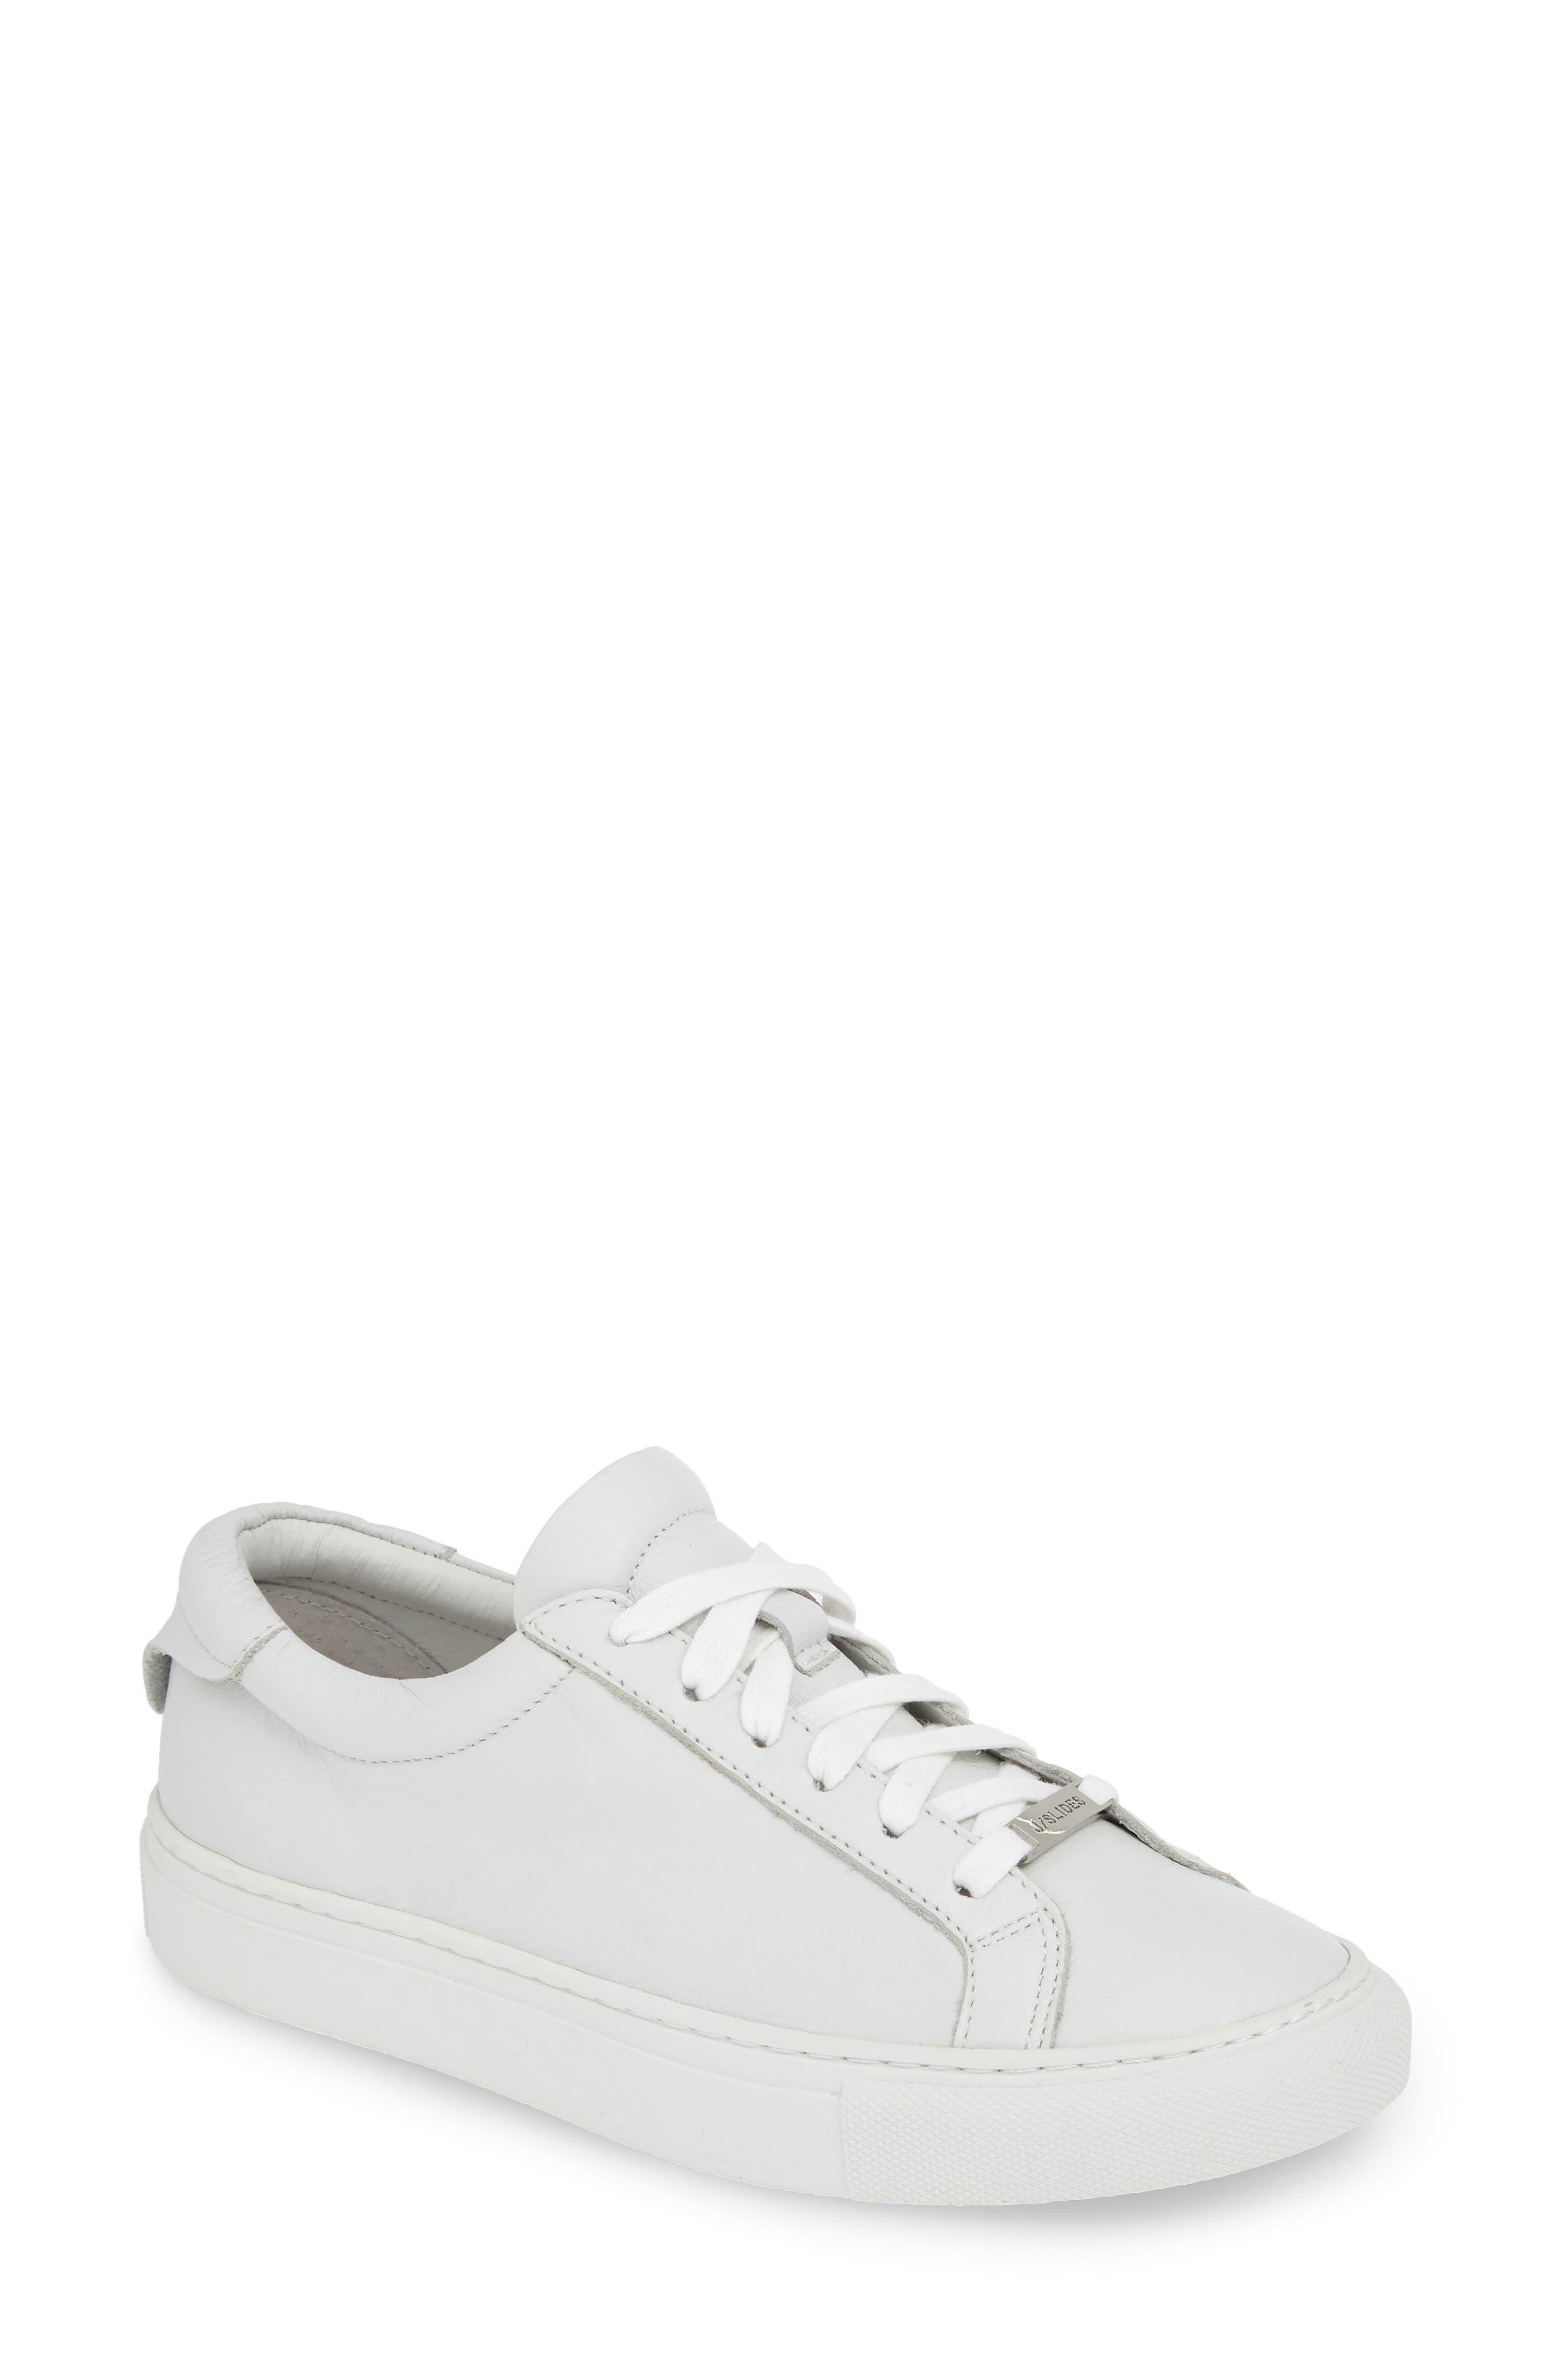 Jslides Lacee Sneaker, White